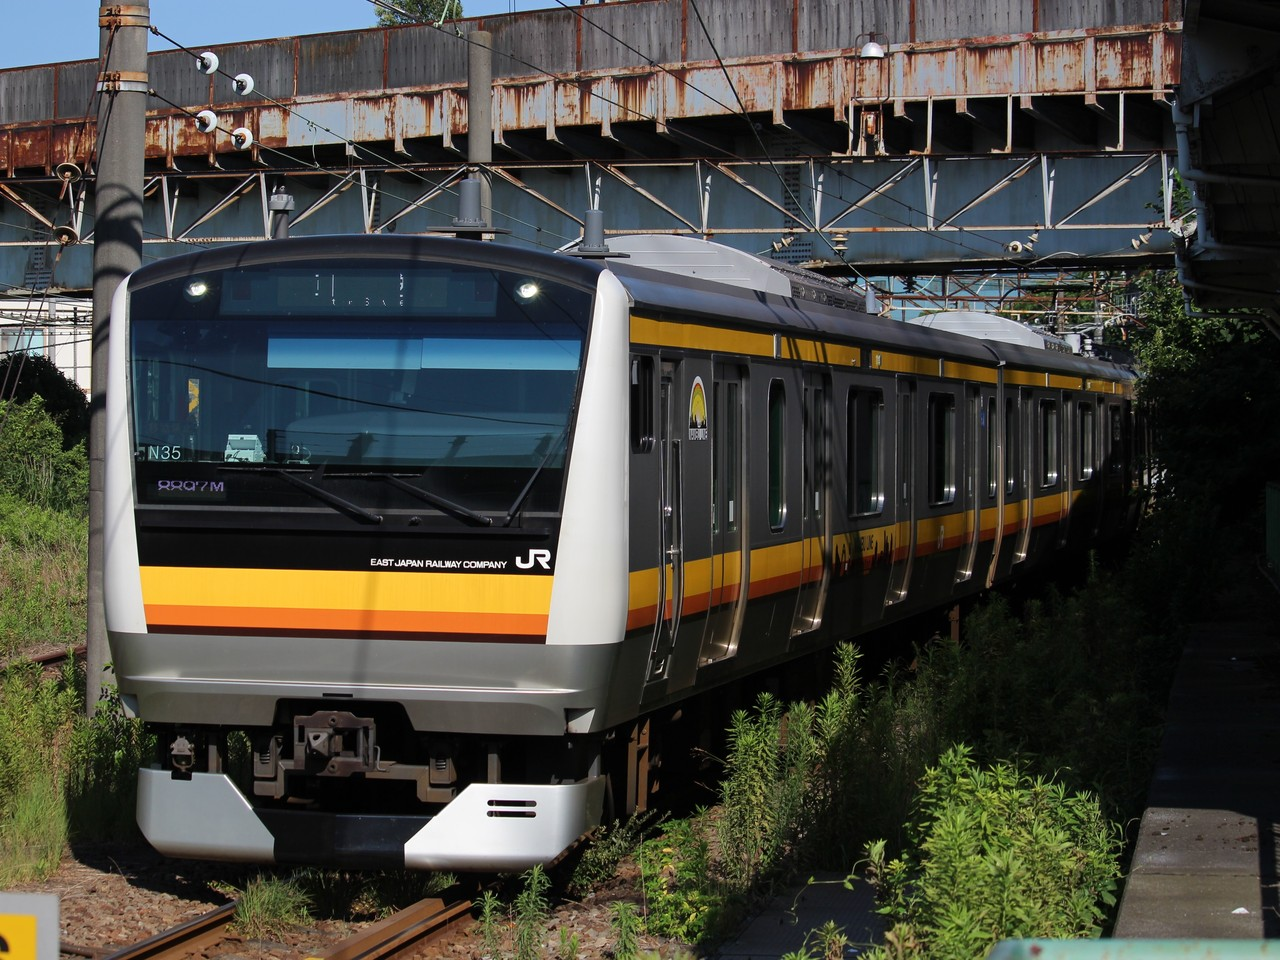 http://livedoor.blogimg.jp/shin_tsurumi/imgs/7/6/765d6178.jpg